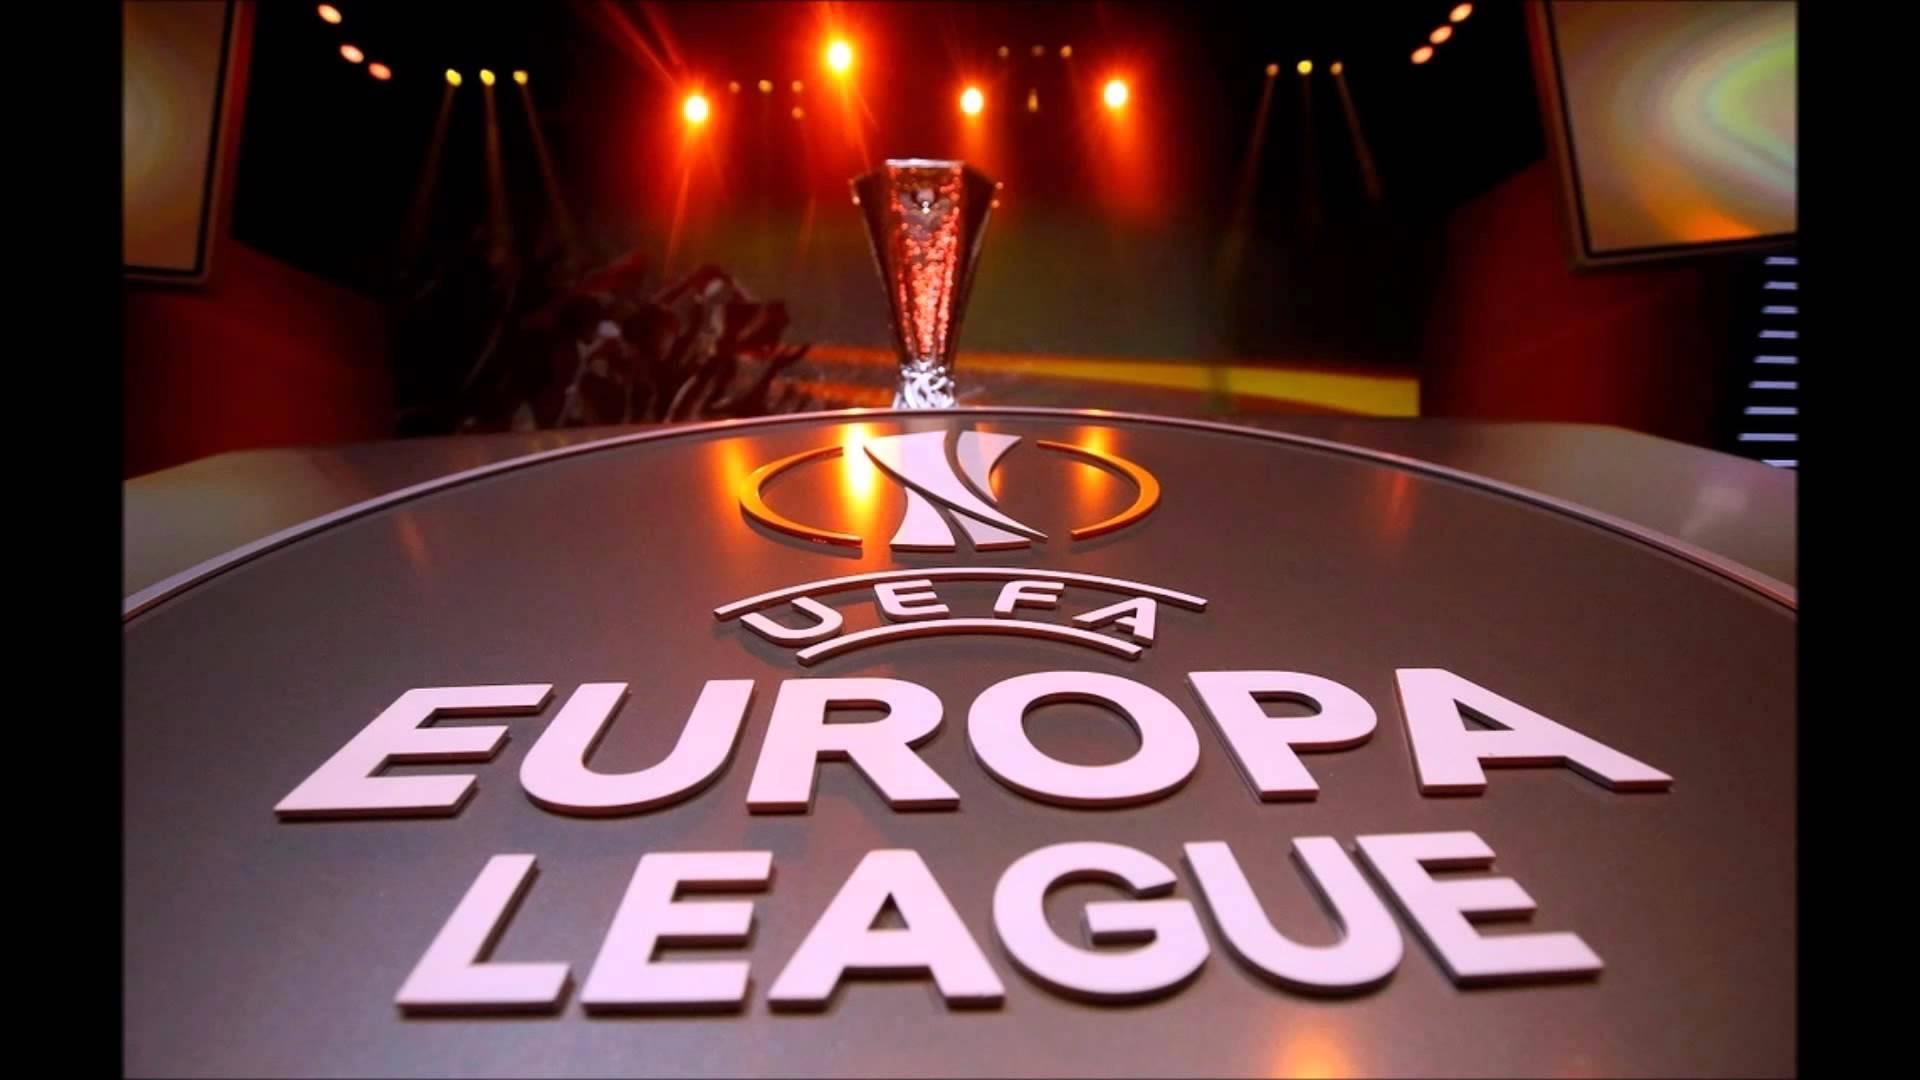 Europa.League